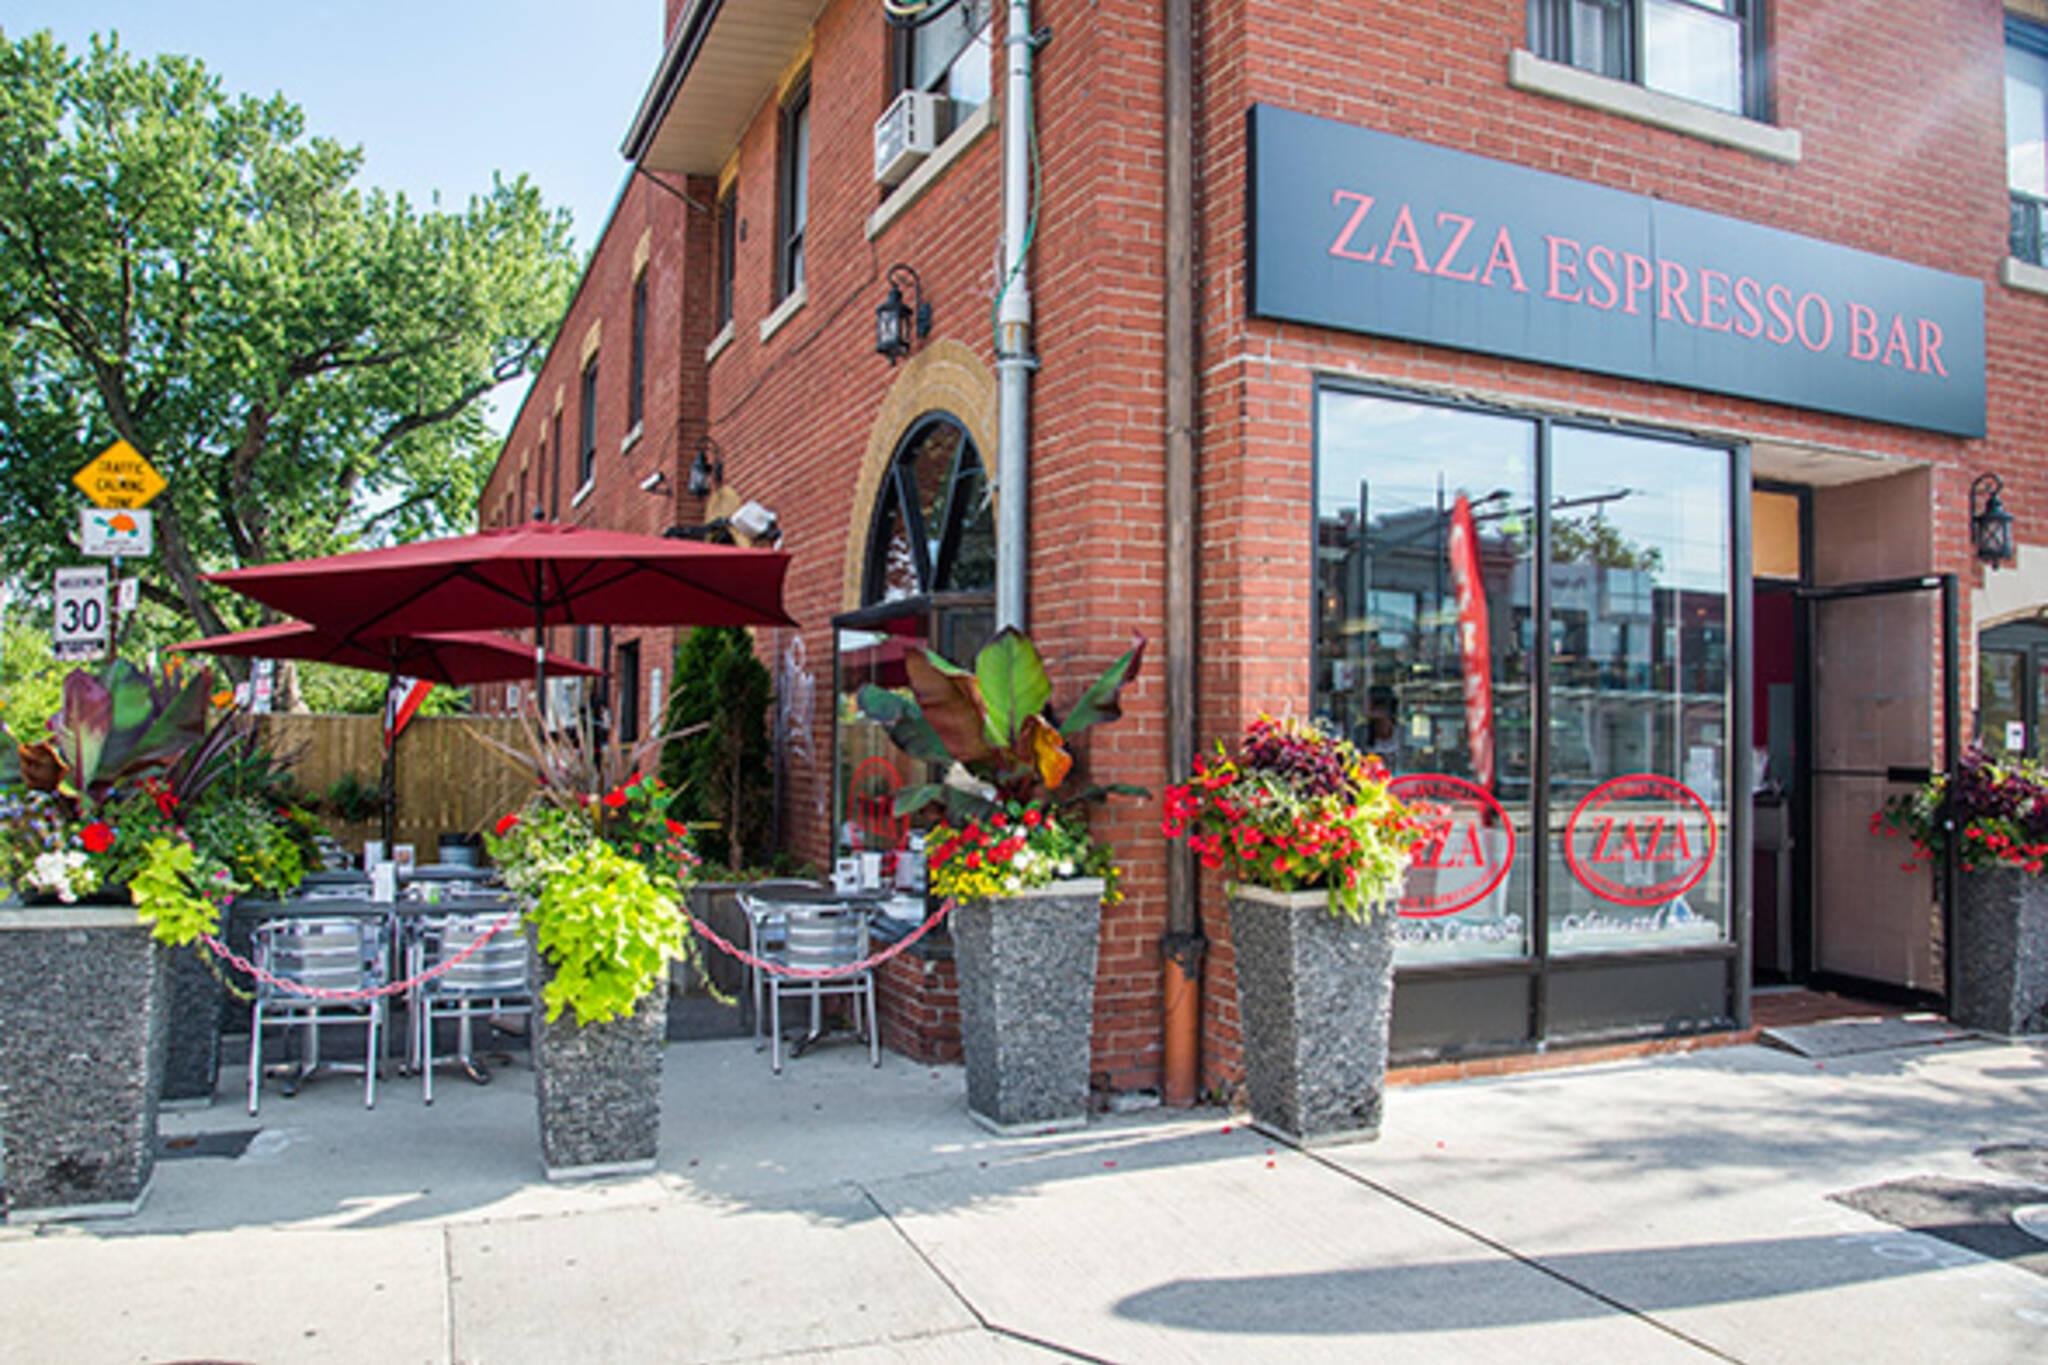 Zaza Espresso Bar